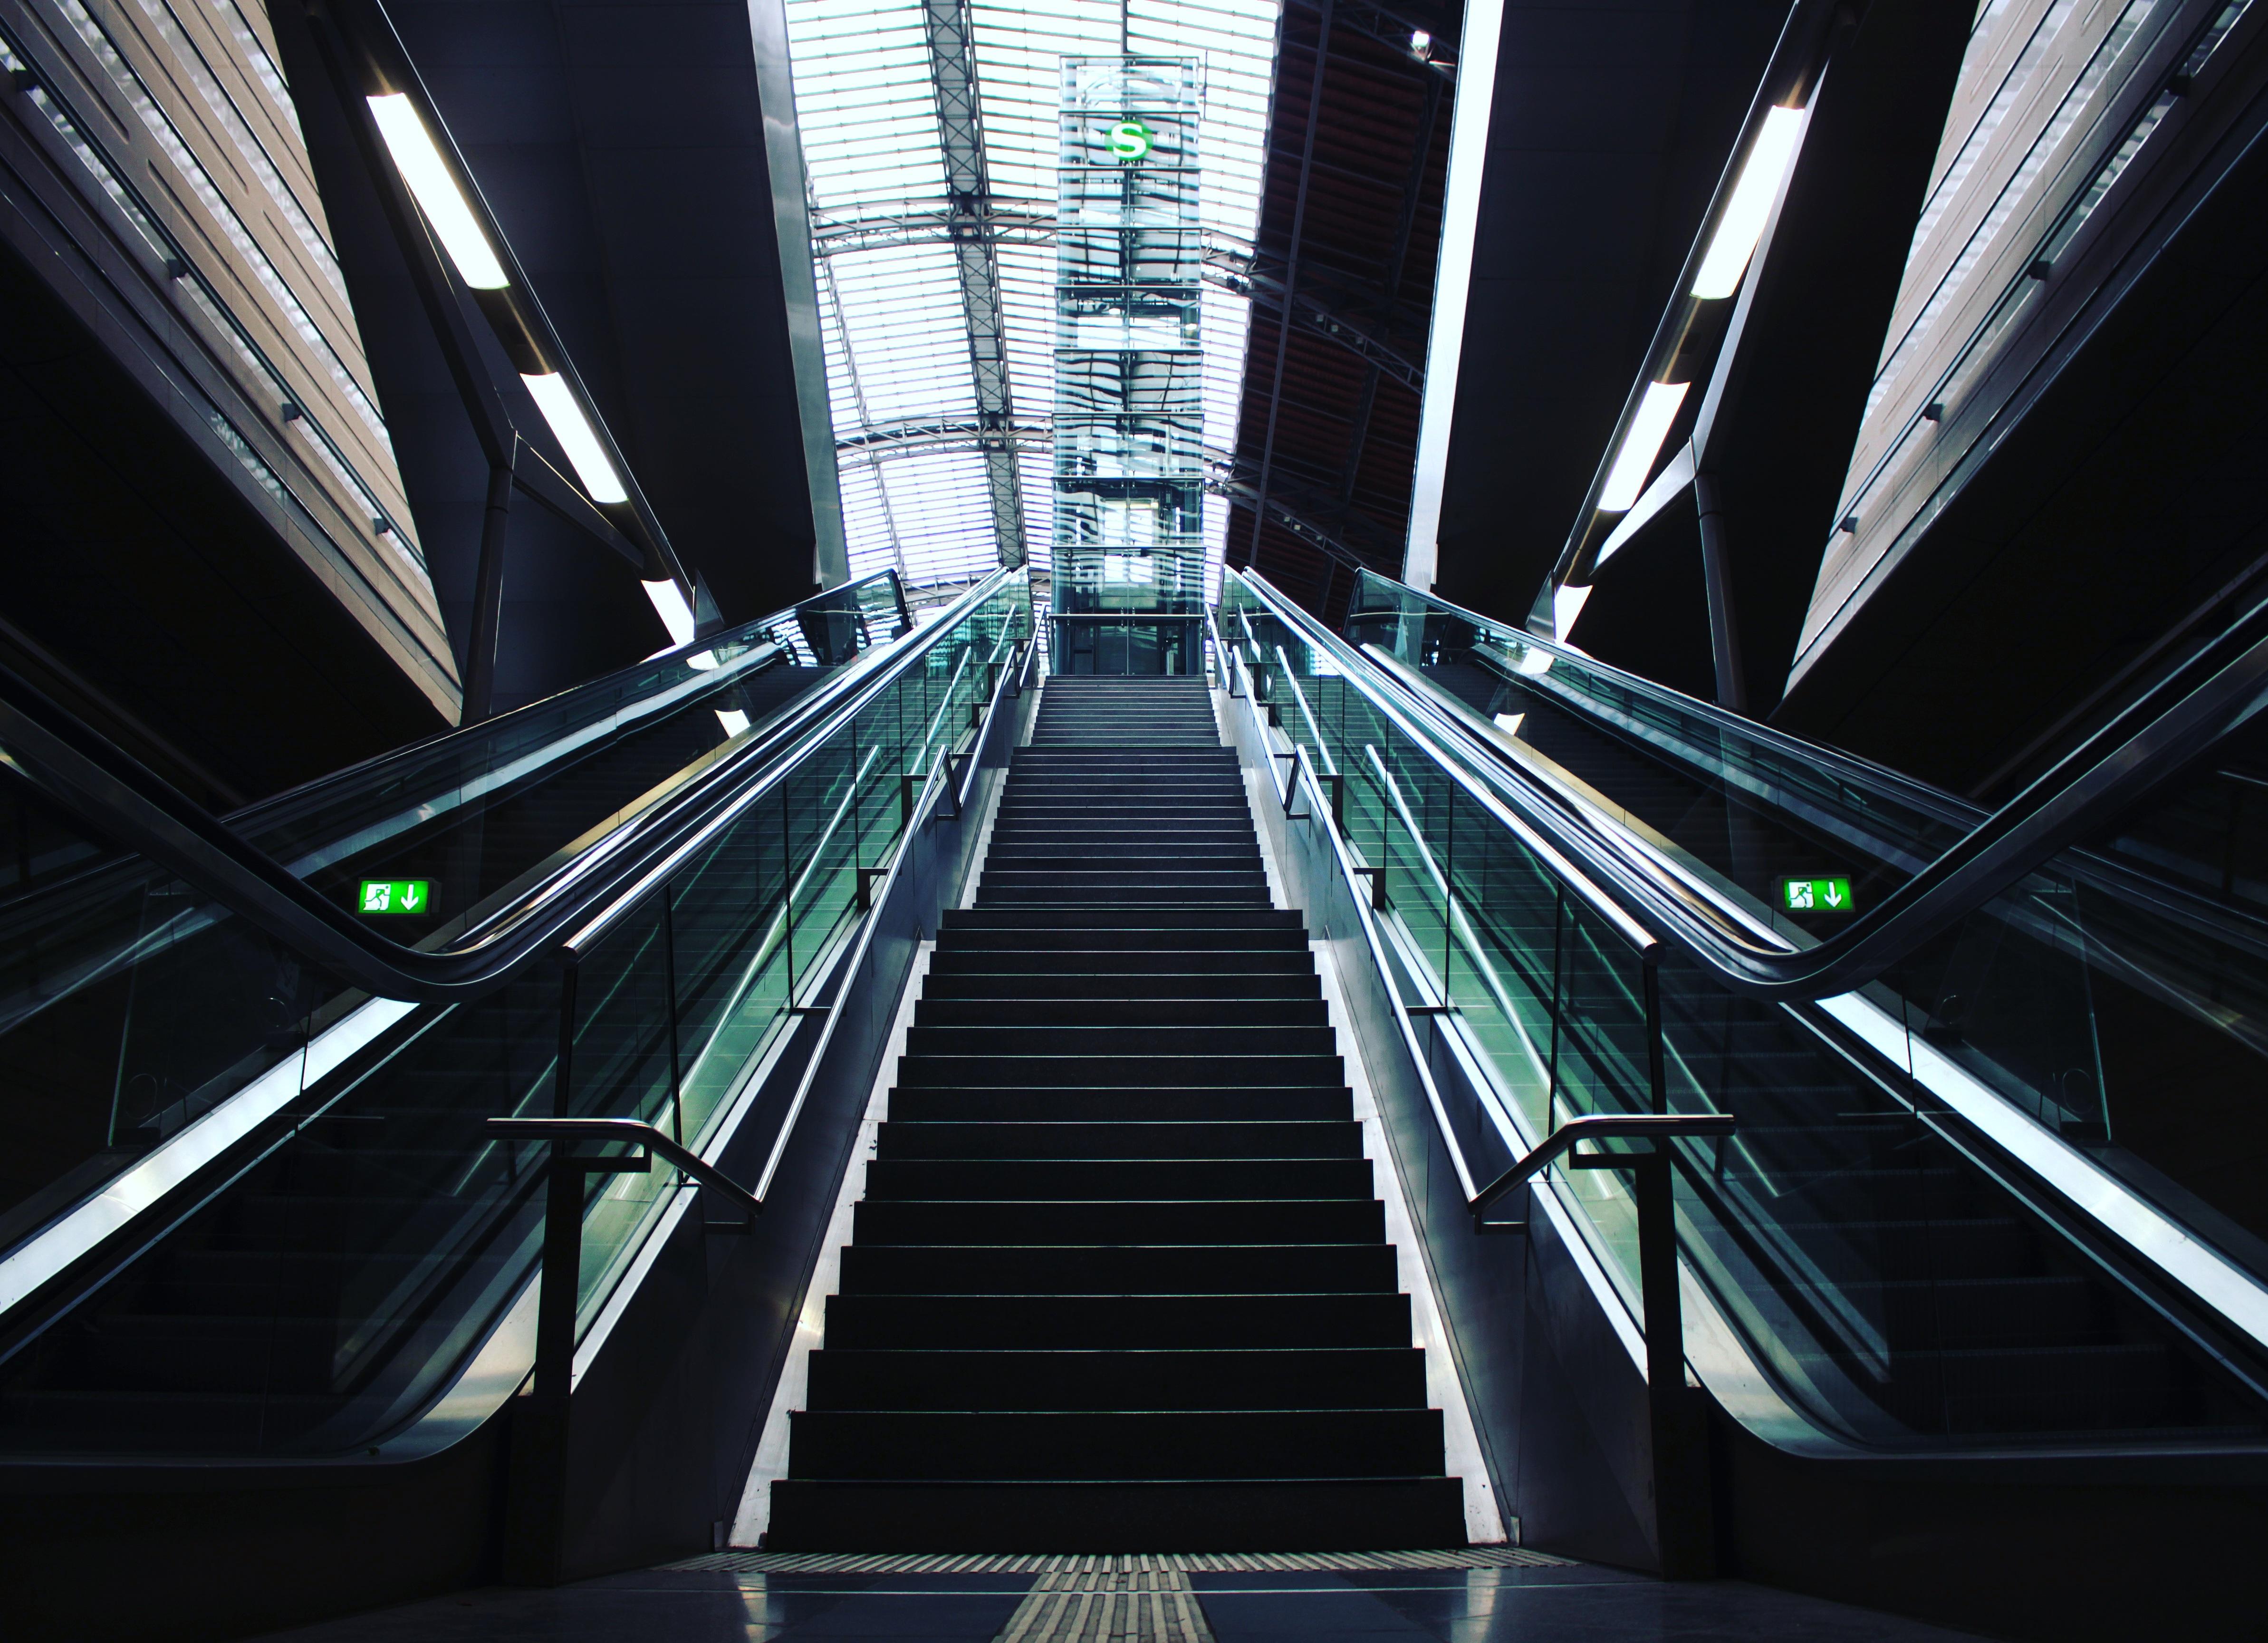 Free Images Light City Escalator Line Modern Public